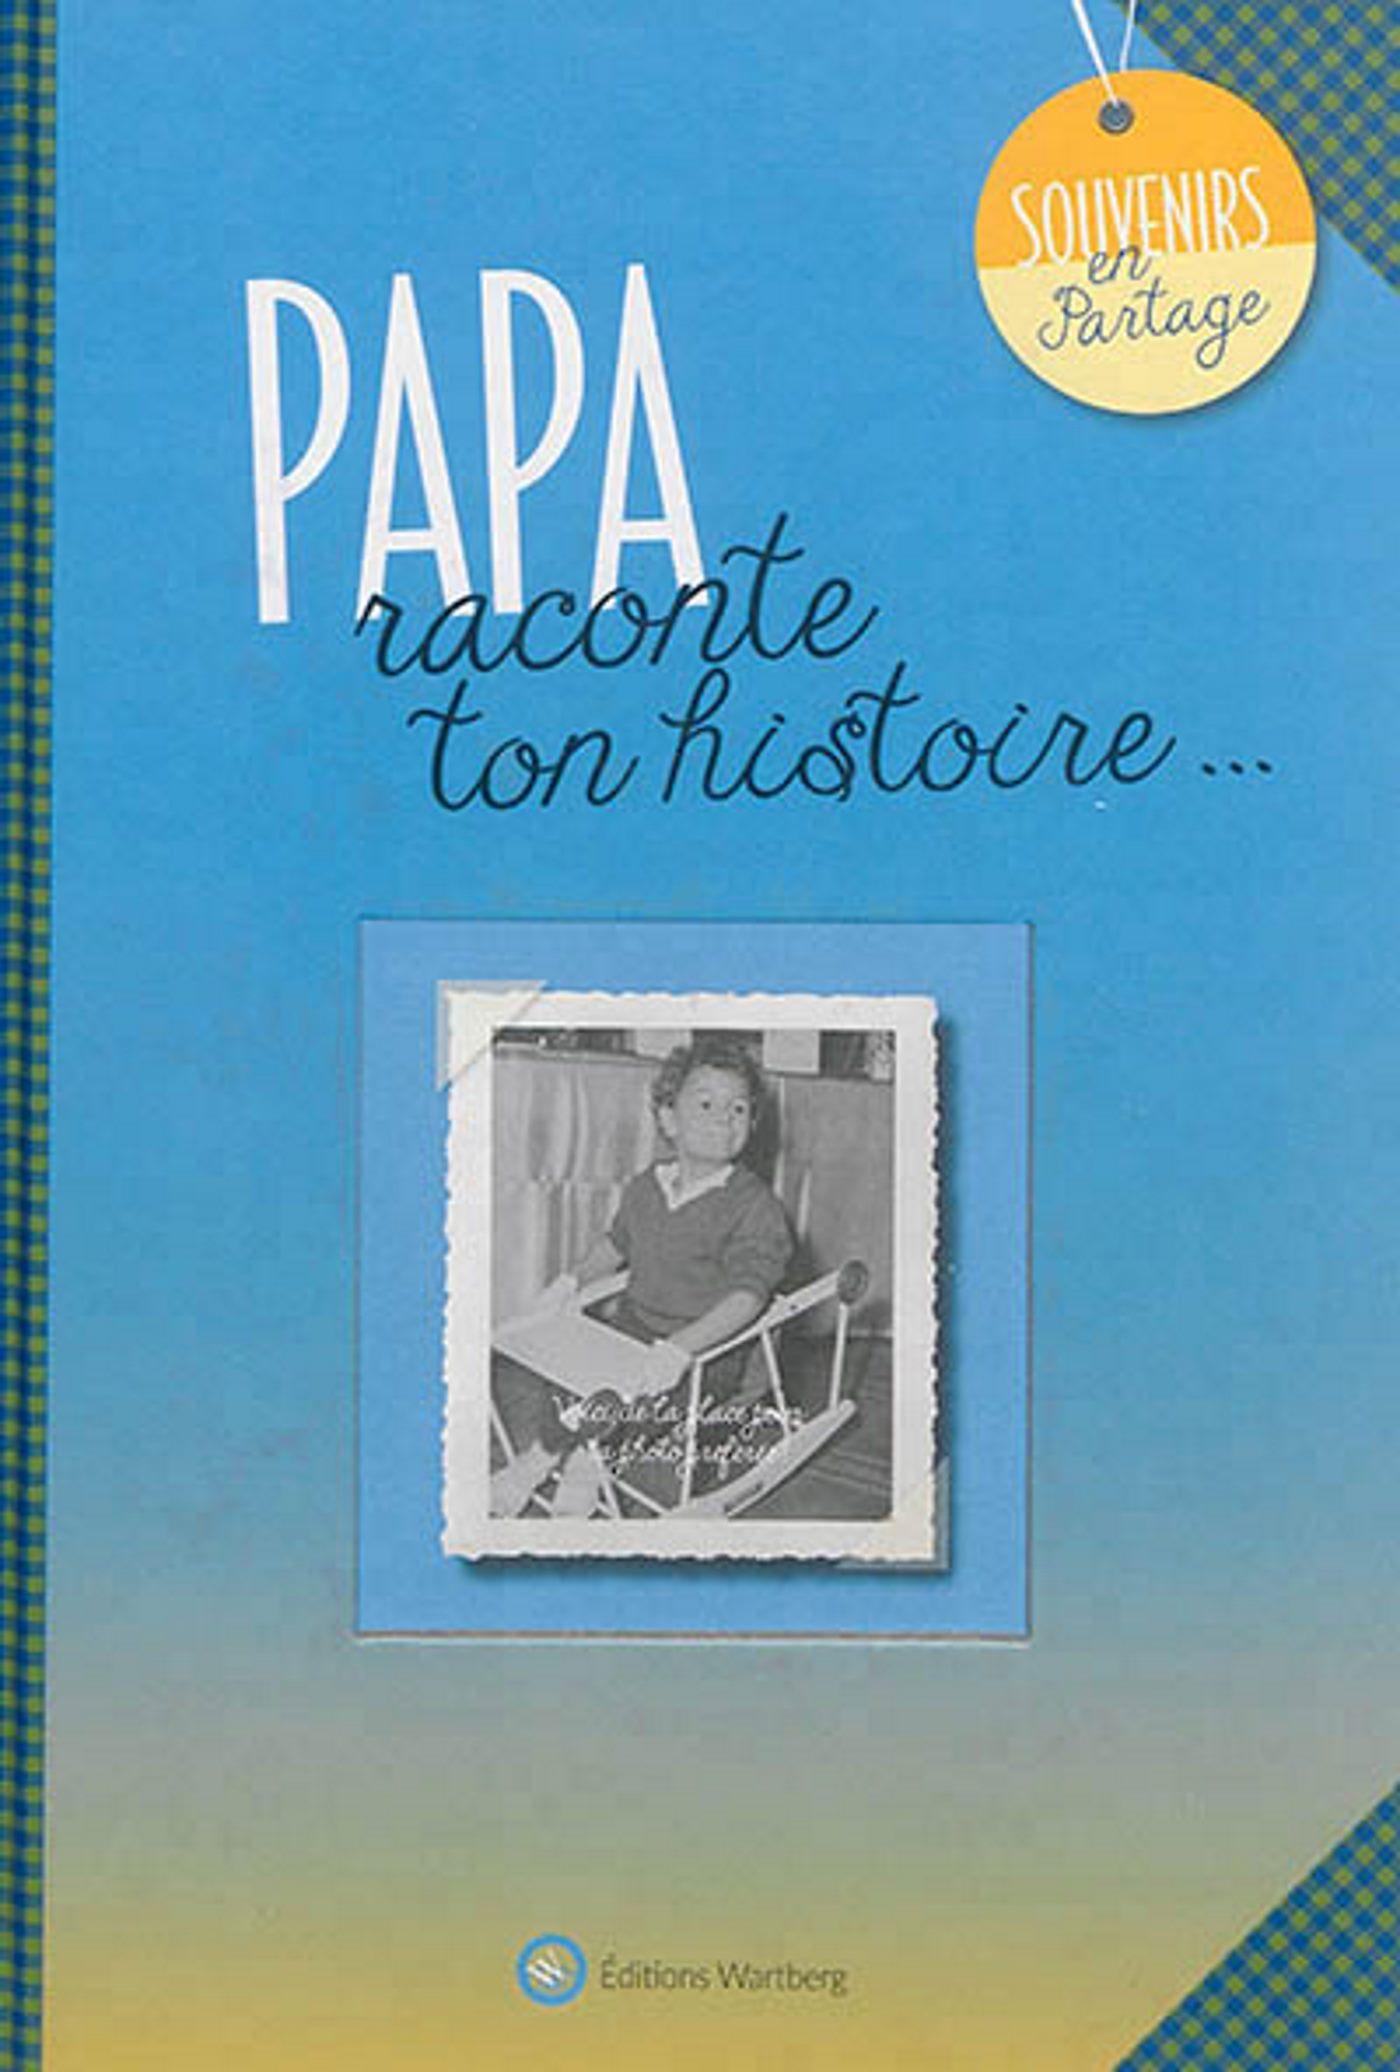 PAPA, RACONTE TON HISTOIRE